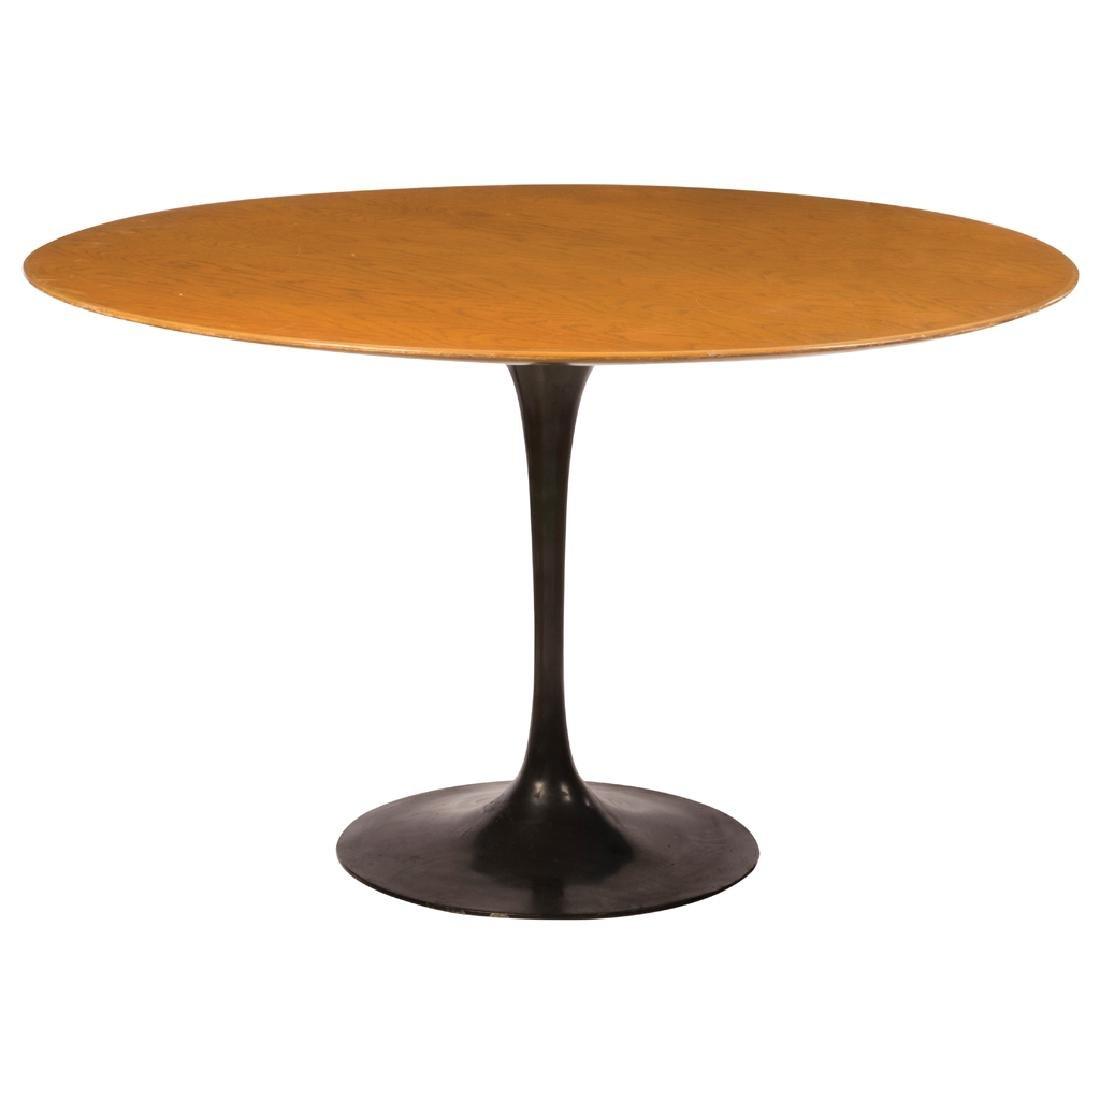 Eero Saarinen for Knoll international. Black lacquered